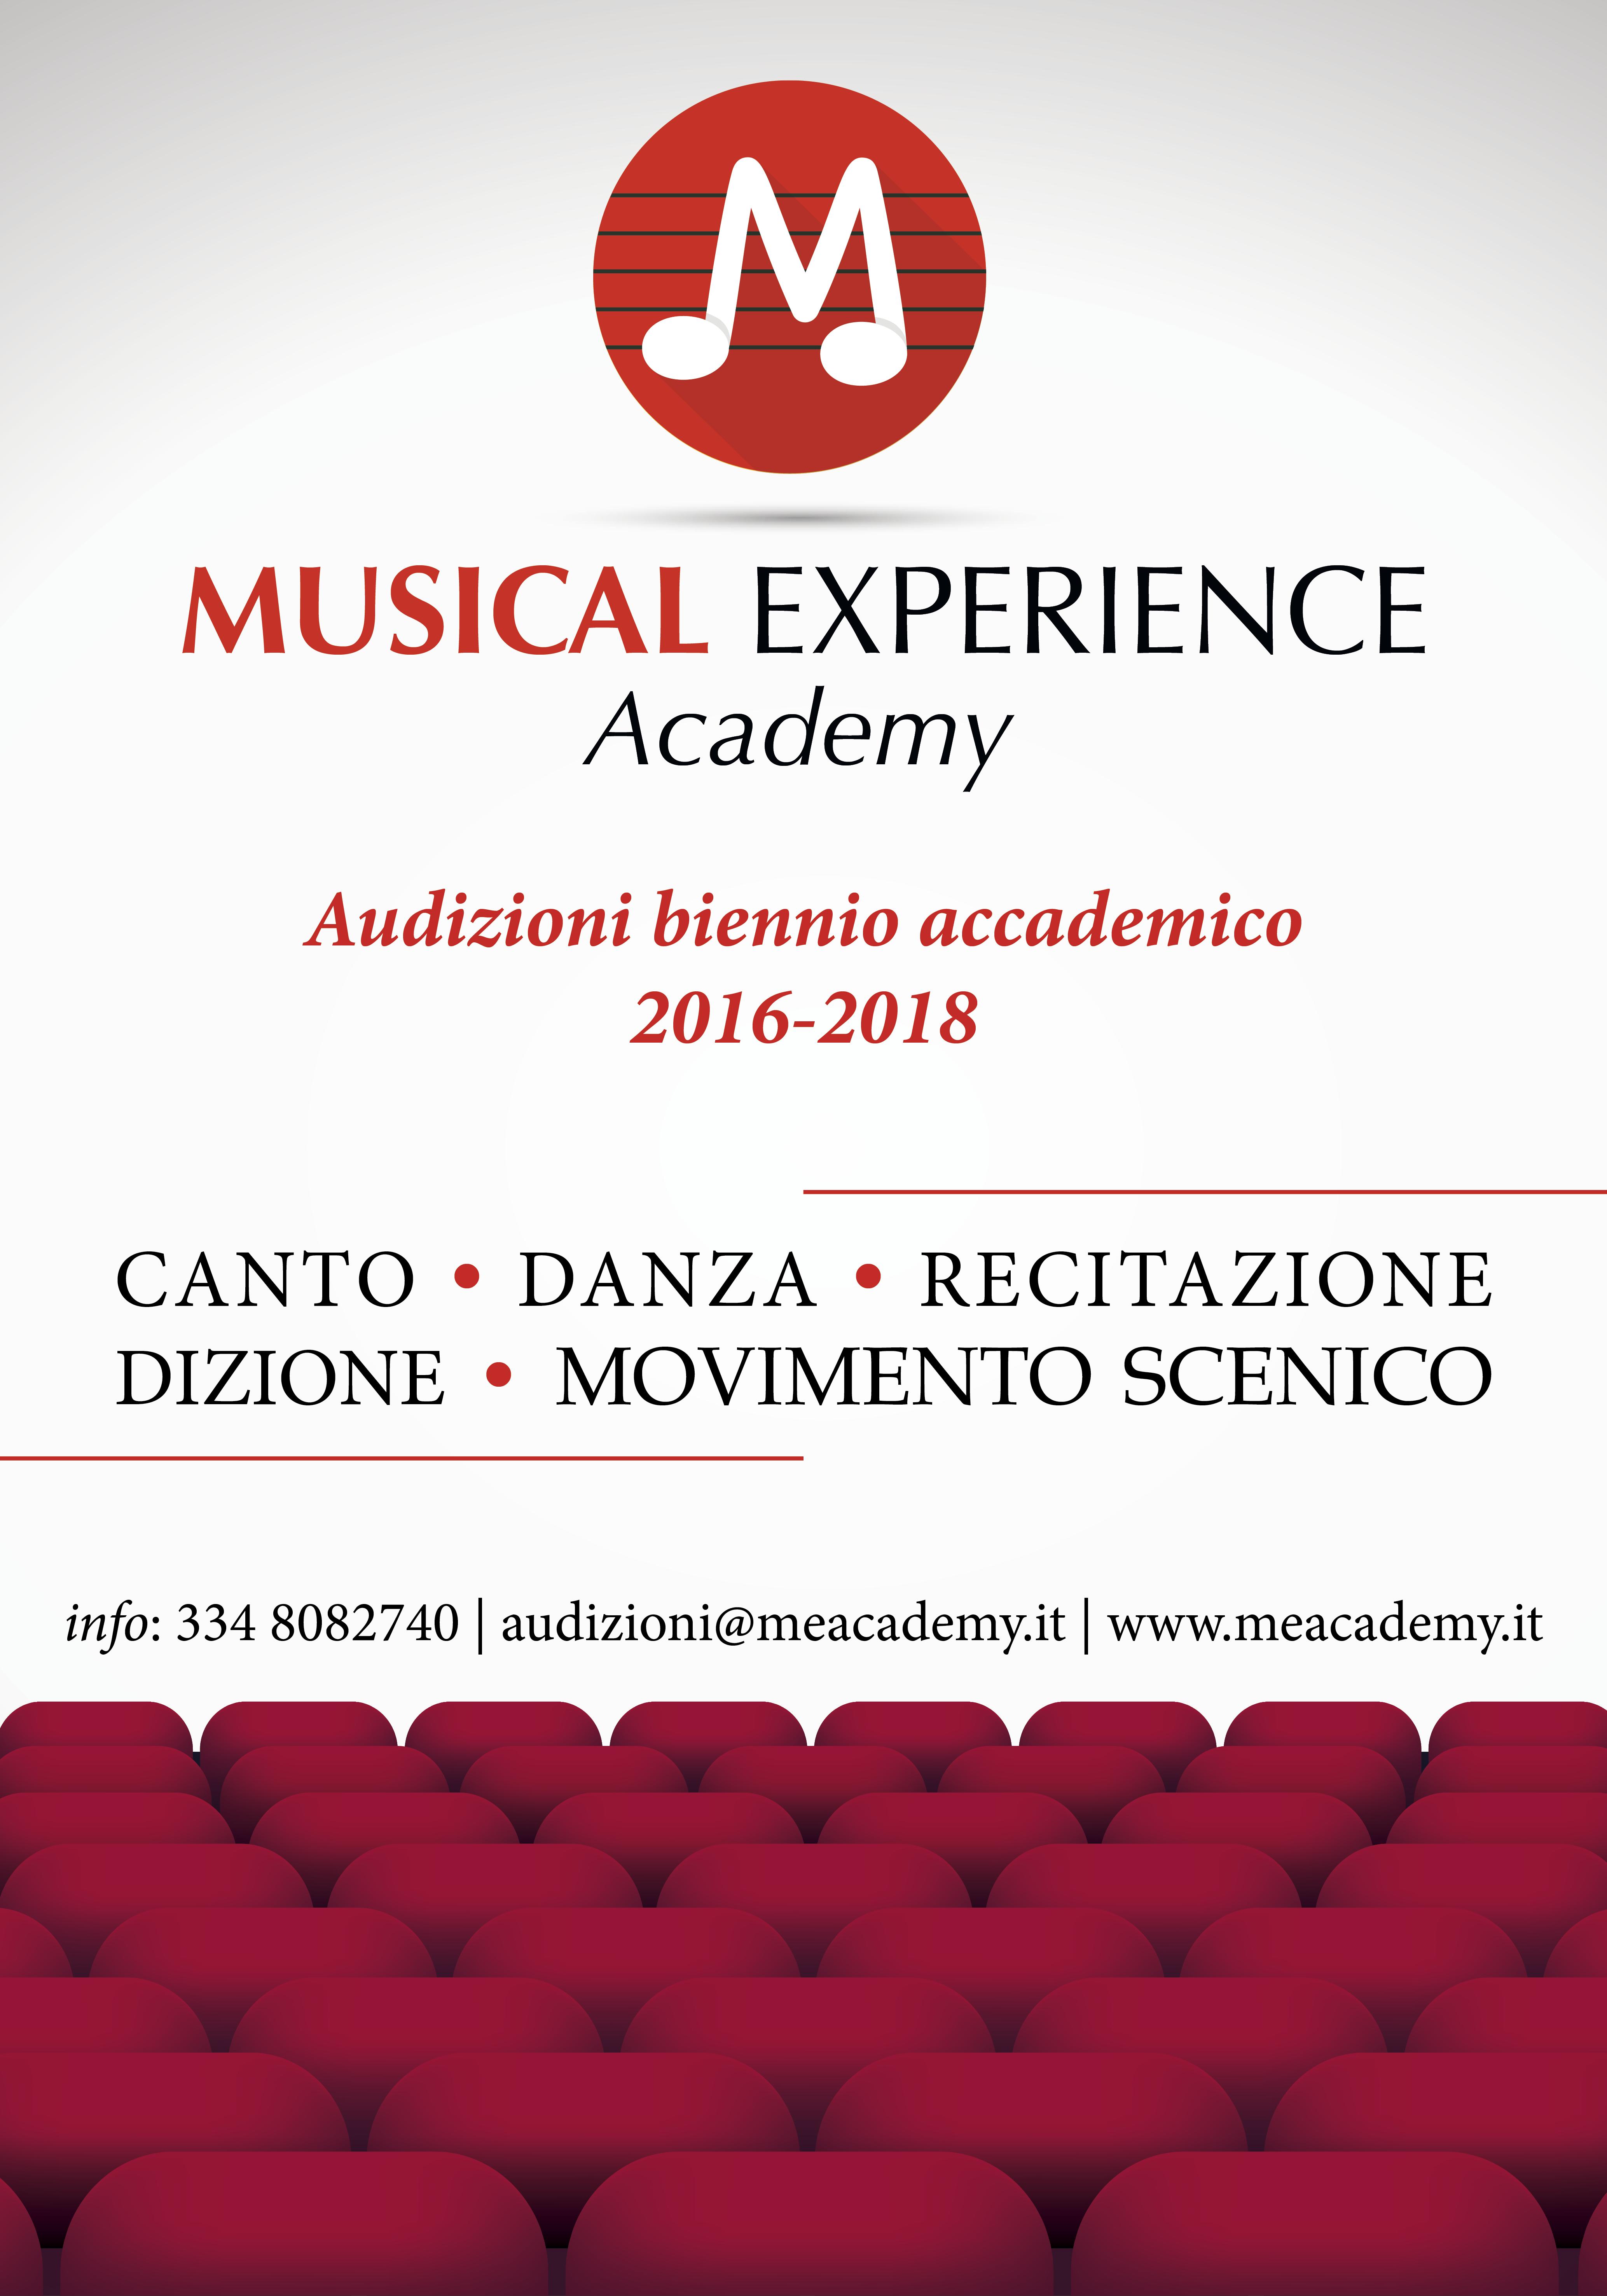 nasce-teramo-la-scuola-musical-musical-experience-academy